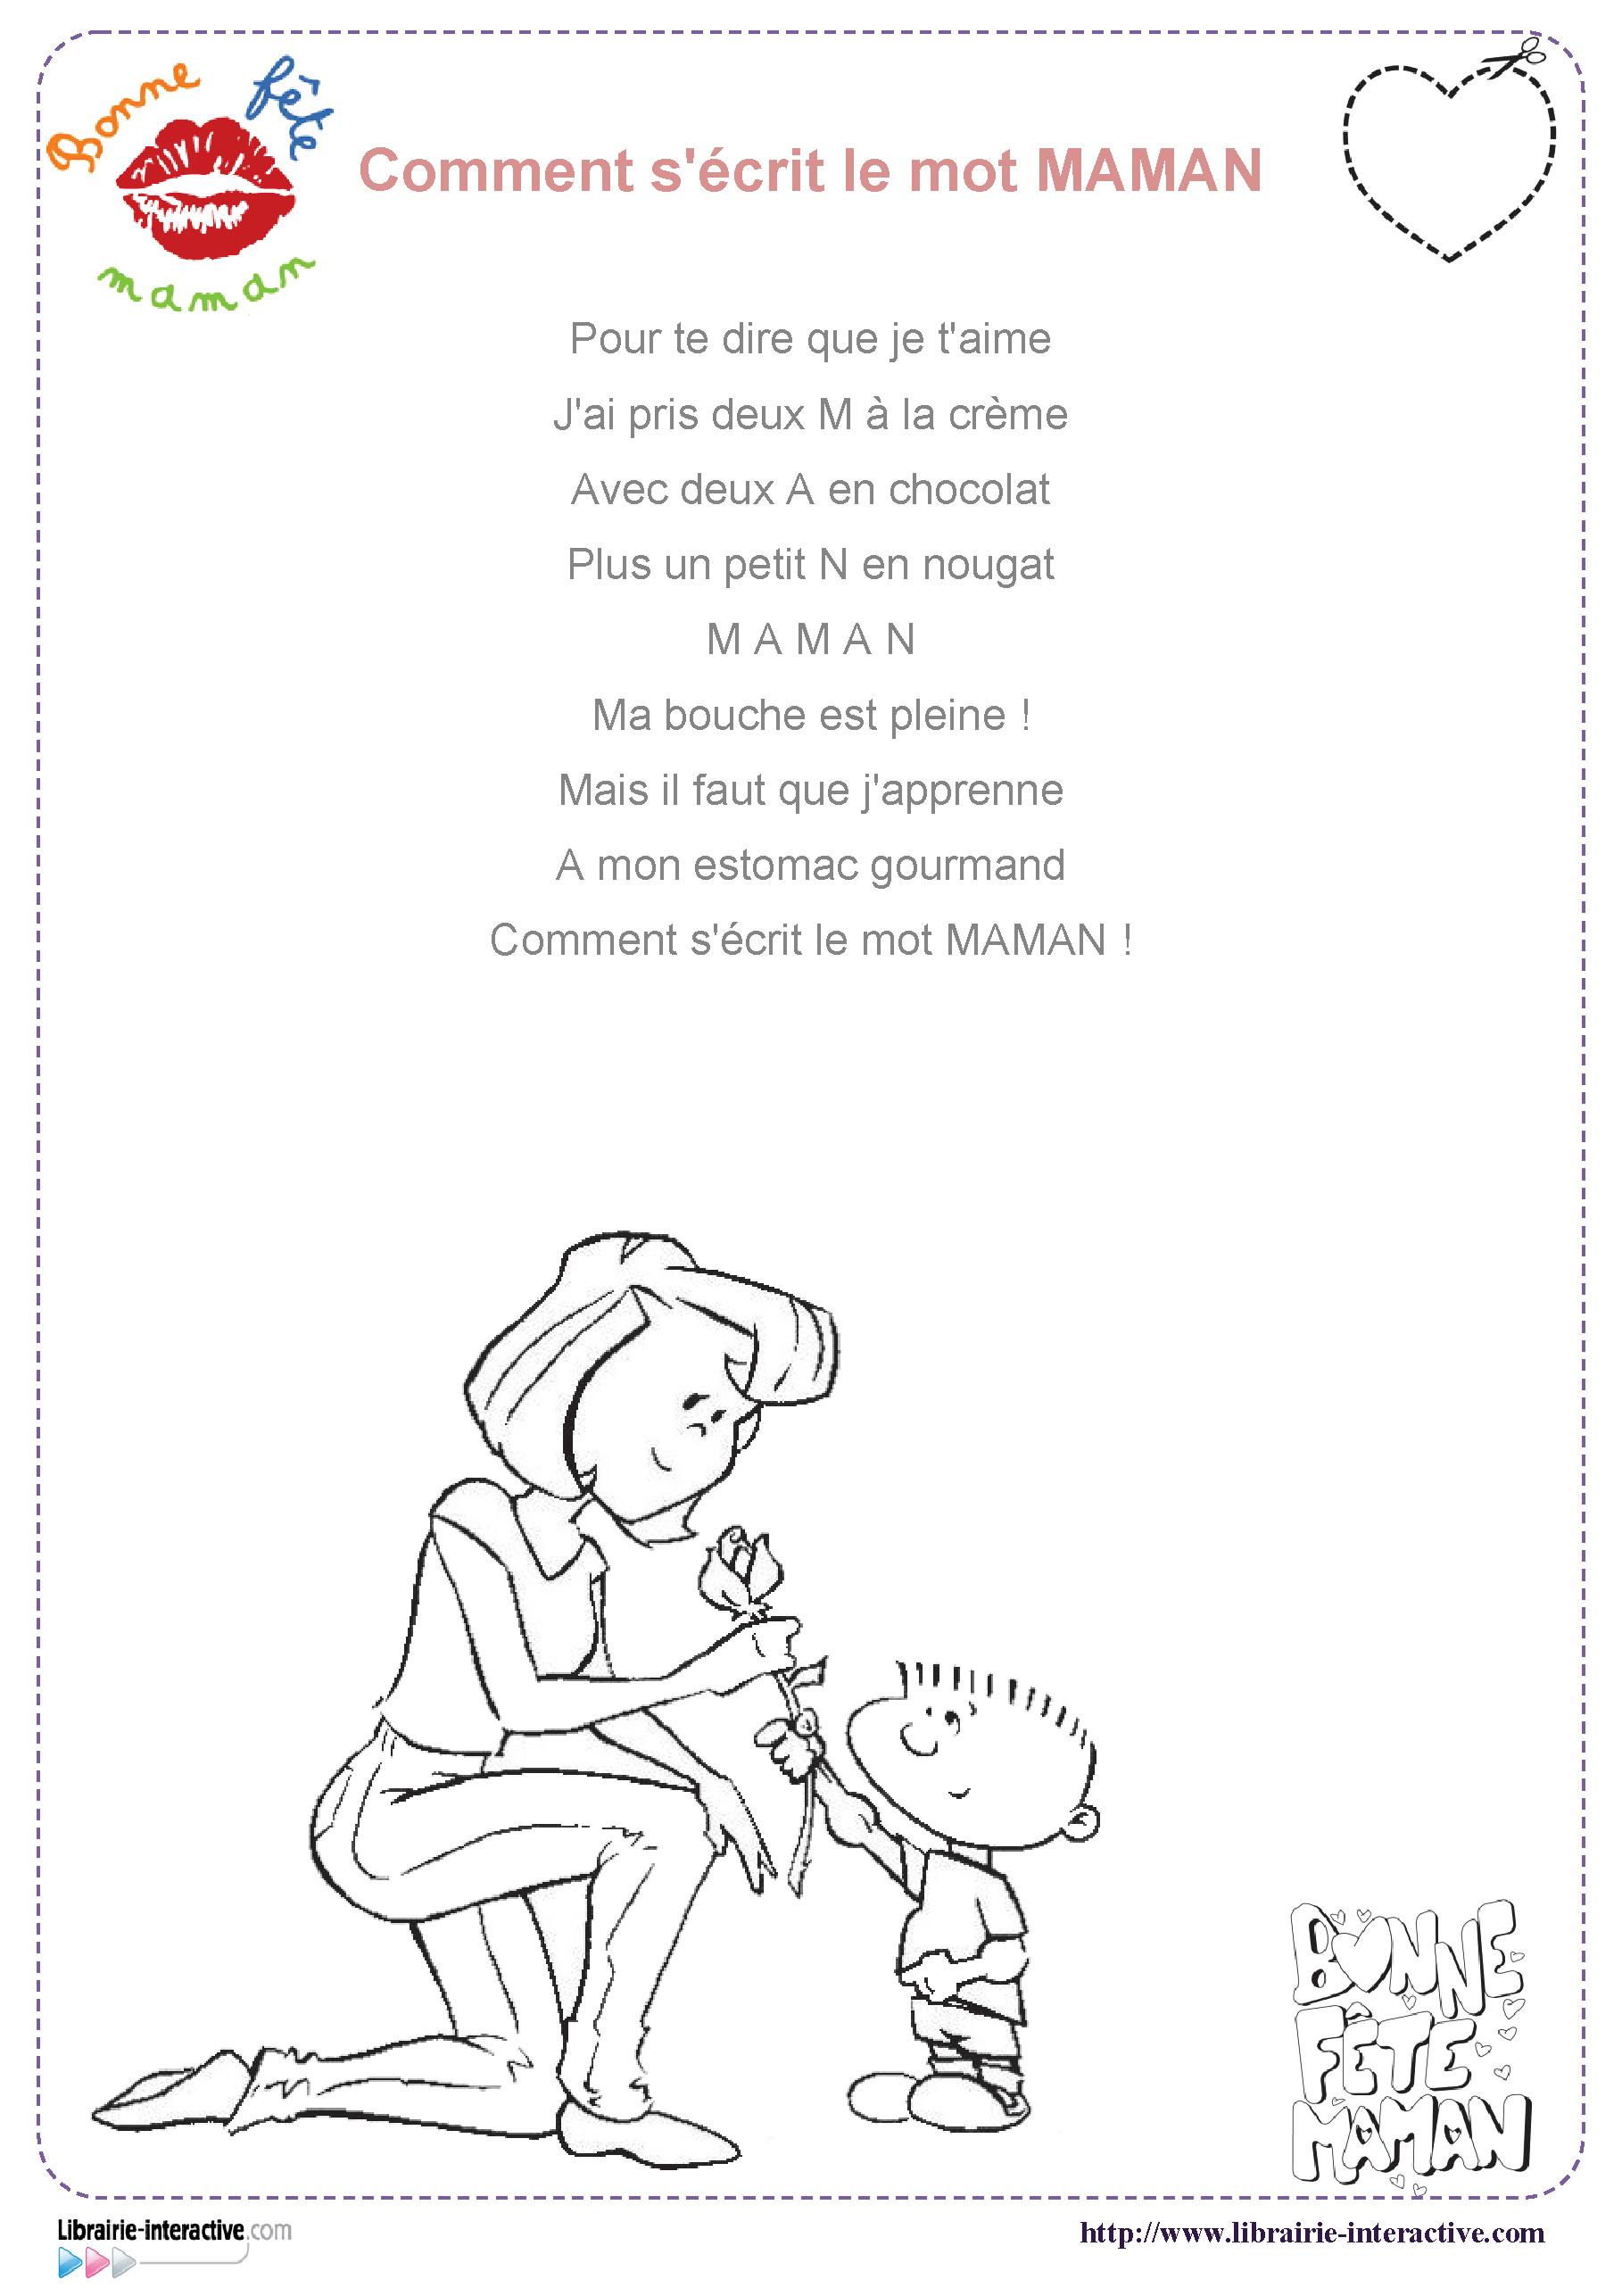 Inspirant Image Fete Des Meres A Imprimer